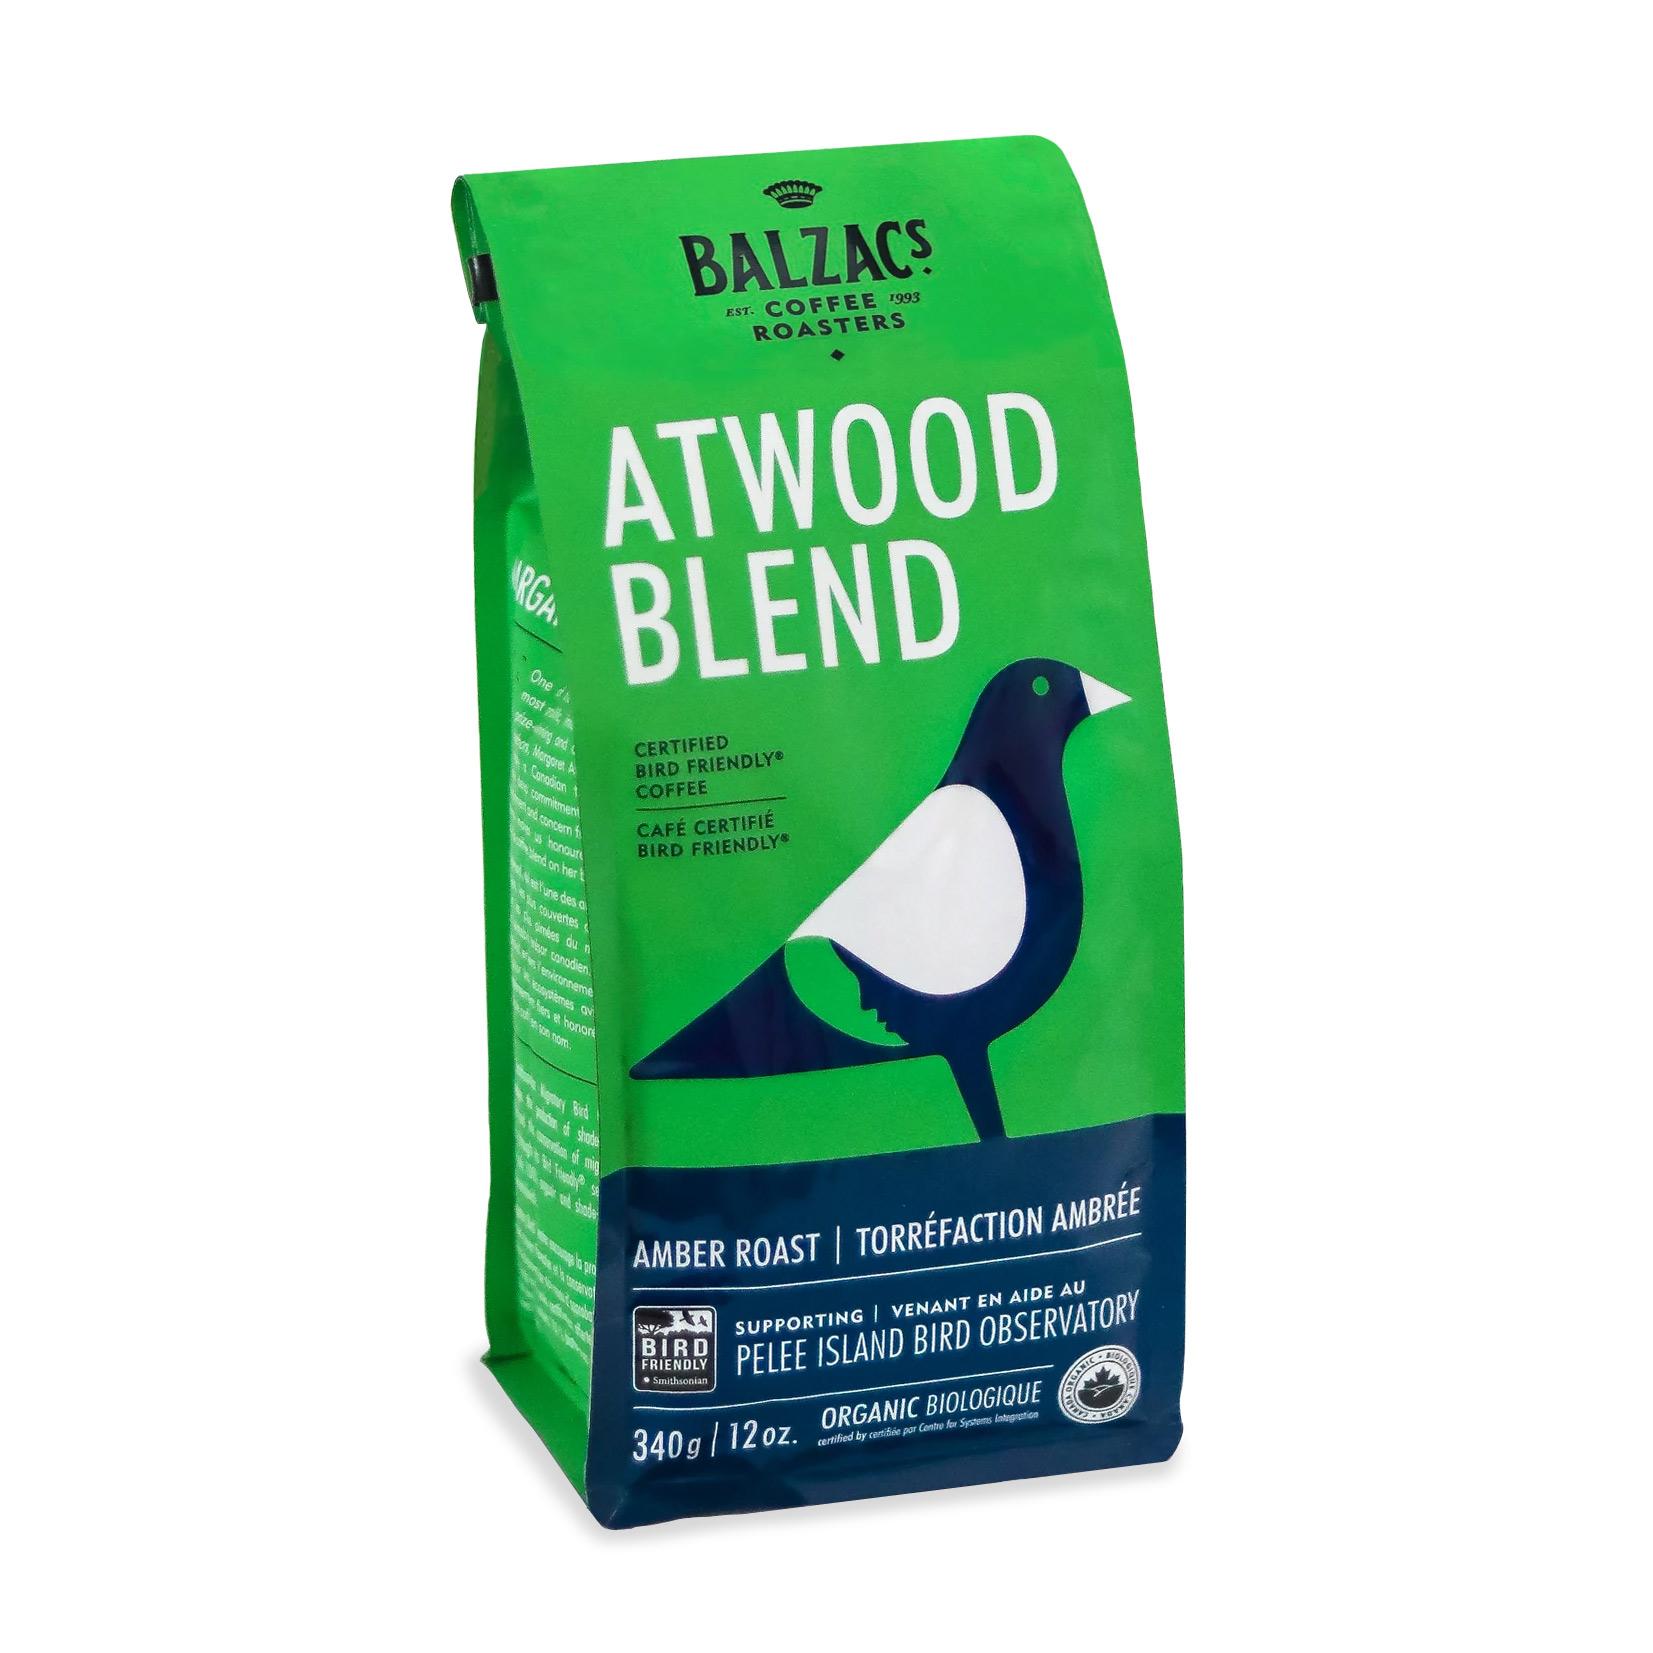 Balzac's Coffee Roasters Atwood Blend Beans - 12 oz